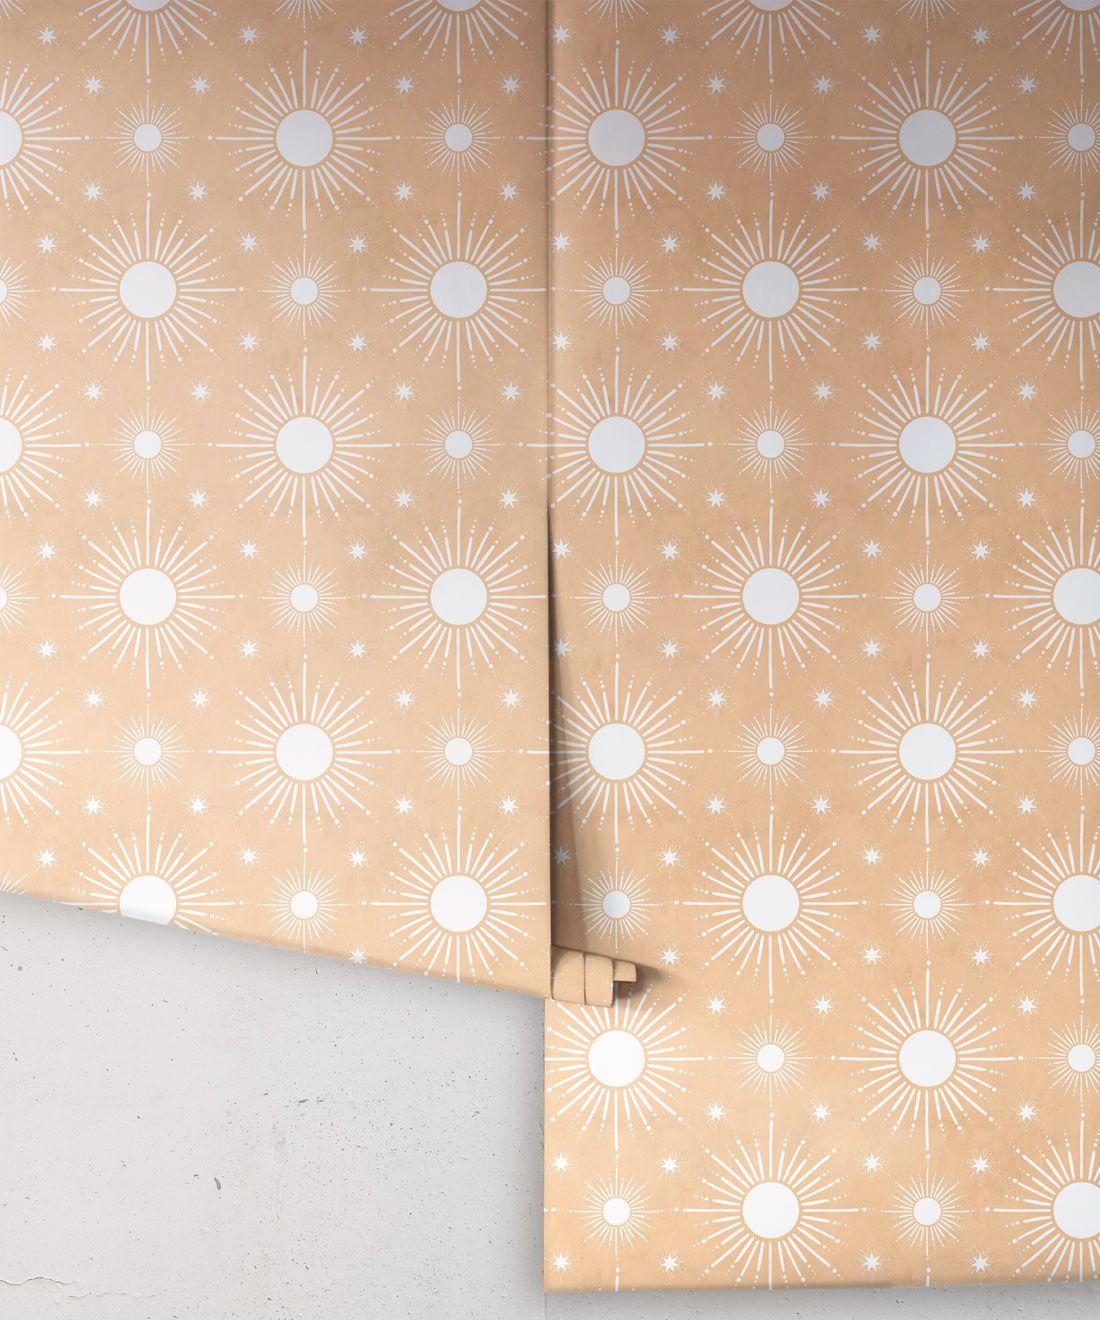 Sun Light Star Bright Wallpaper • Salmon• Rolls